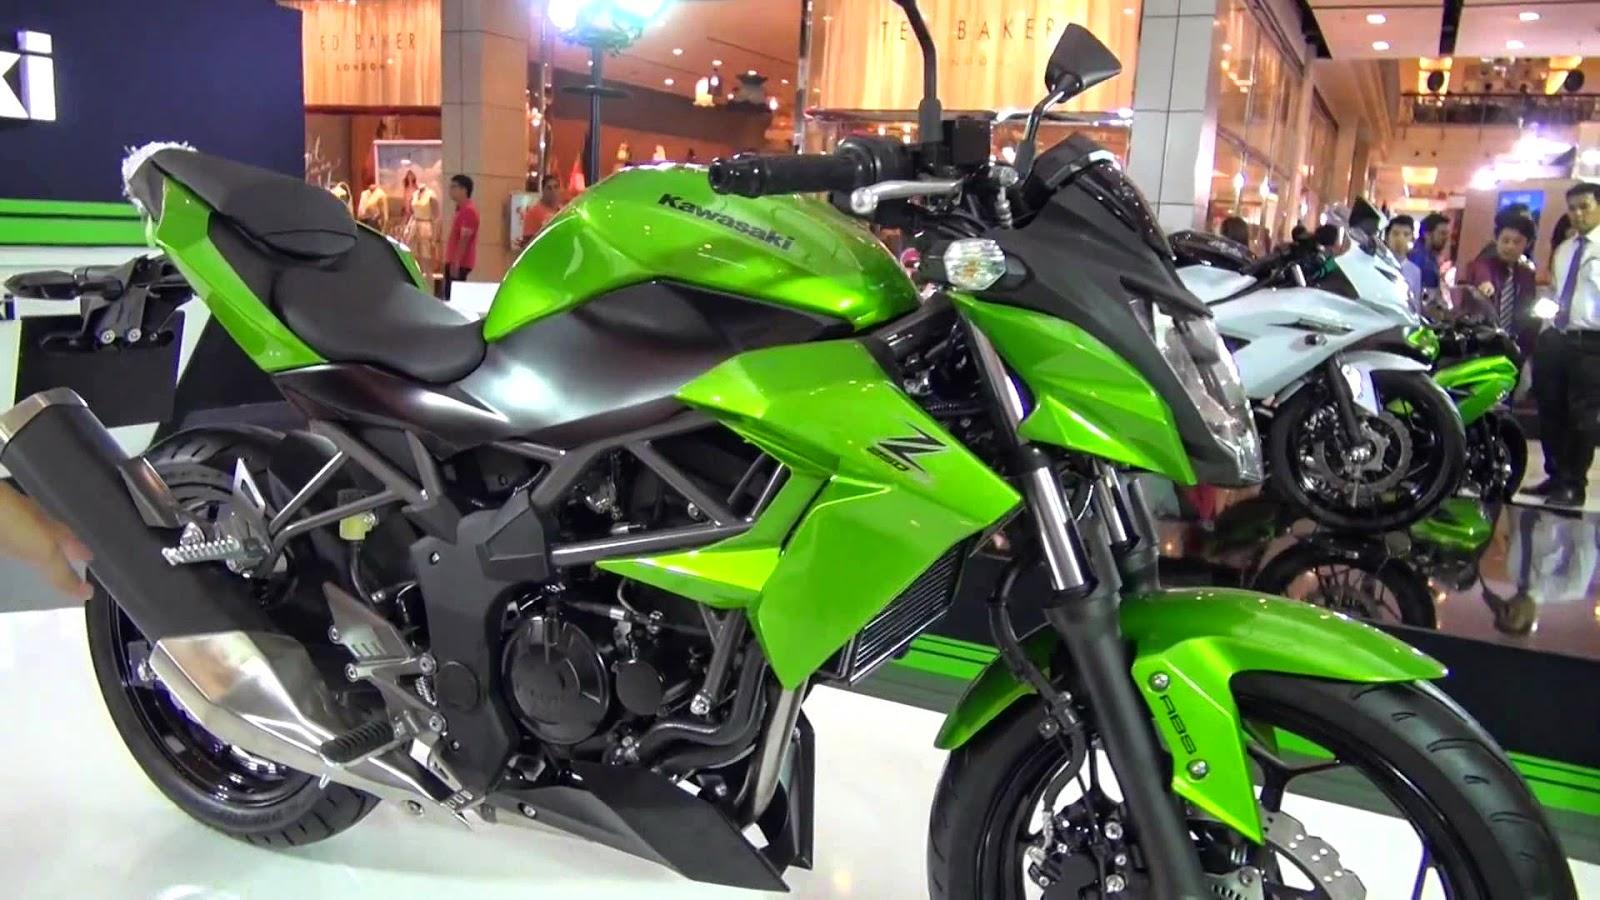 Kawasaki To Launch Ninja Z250sl Zx6r 636 And Vulcan S In India